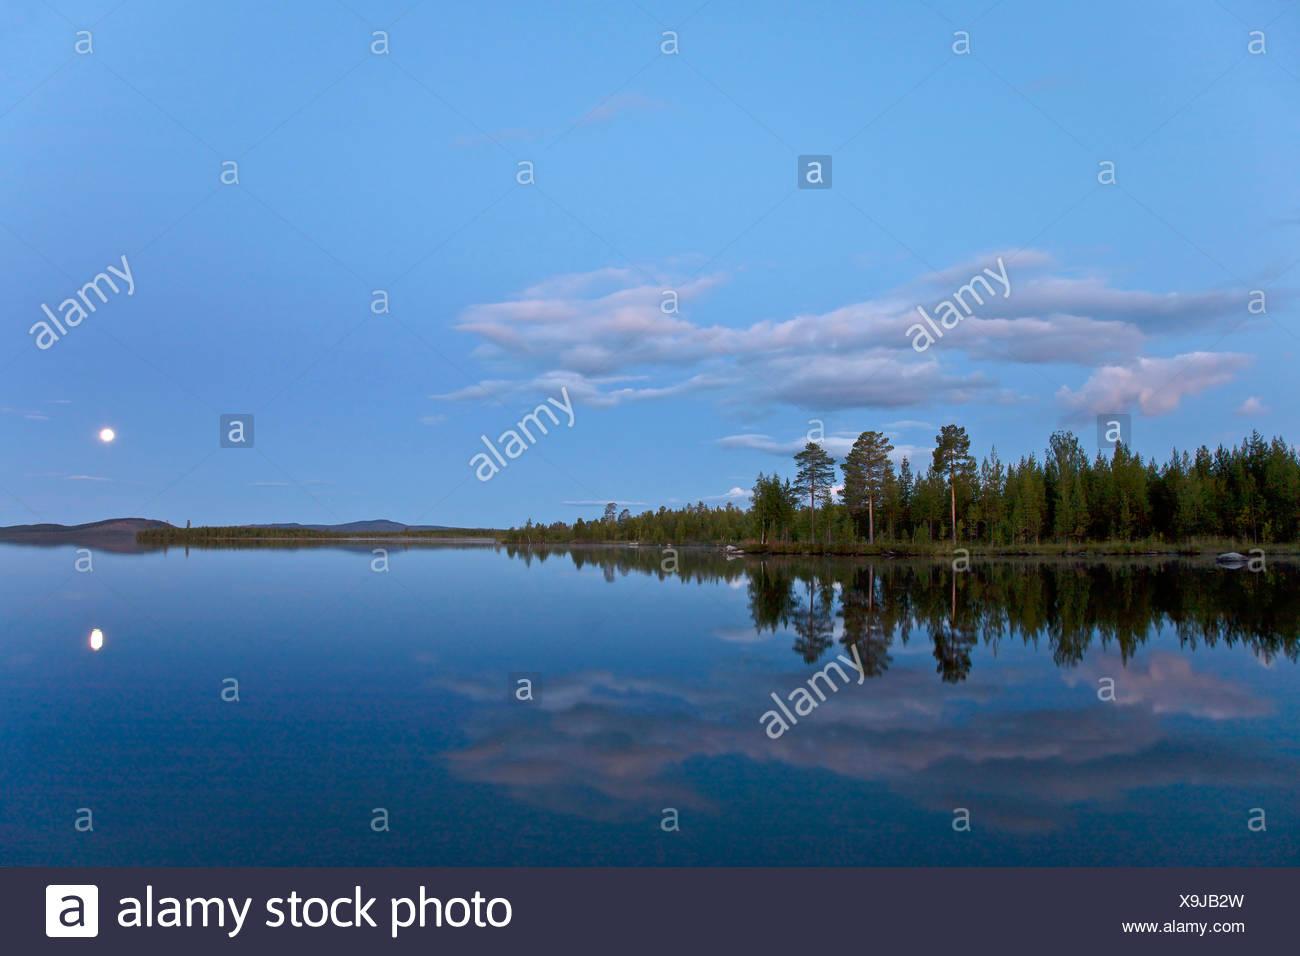 full moon mirroring in a lake in evening light, Sweden, Lapland, Norrbottens Laen, Kvikkjokk - Stock Image